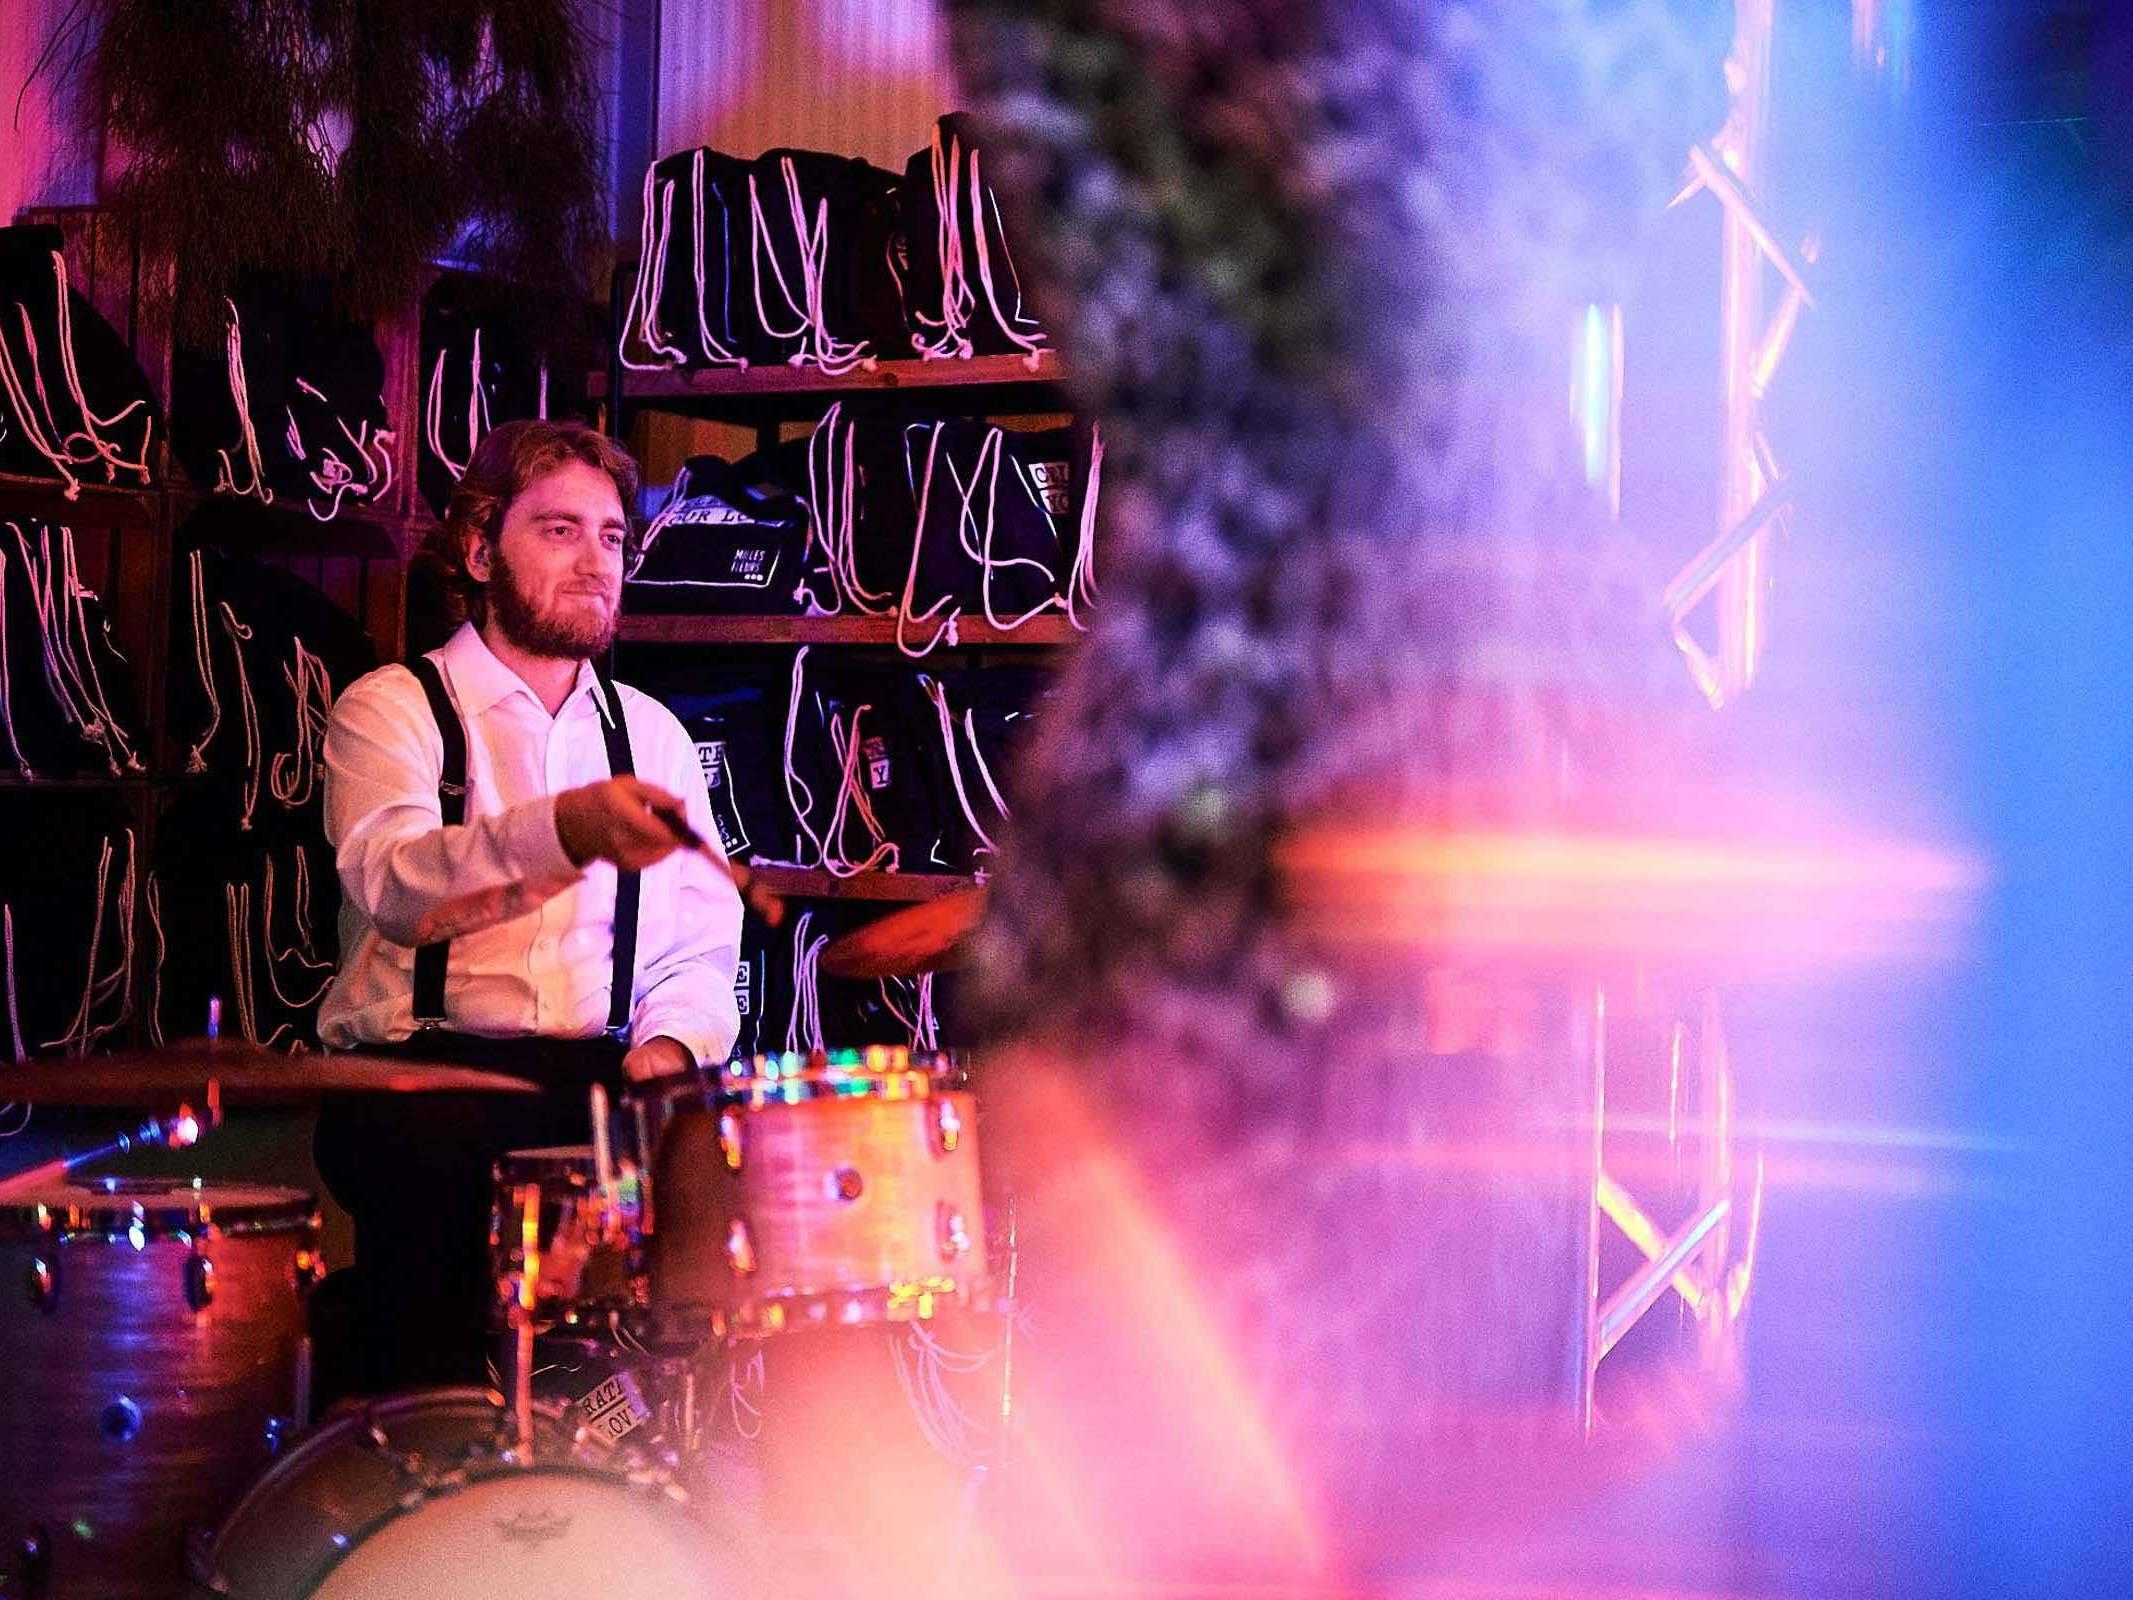 Band   Hamburg   Liveband   Livemusik   Partyband   Popband   Jazzband   Swingband   Lounge   Pop   Jazz   Soul   DJ   Saxophon   Schlagzeug   Hochzeitsband   Messe   Firmenfeier   Charity   Gala   Buchen   Mieten   Hamburgfeiert